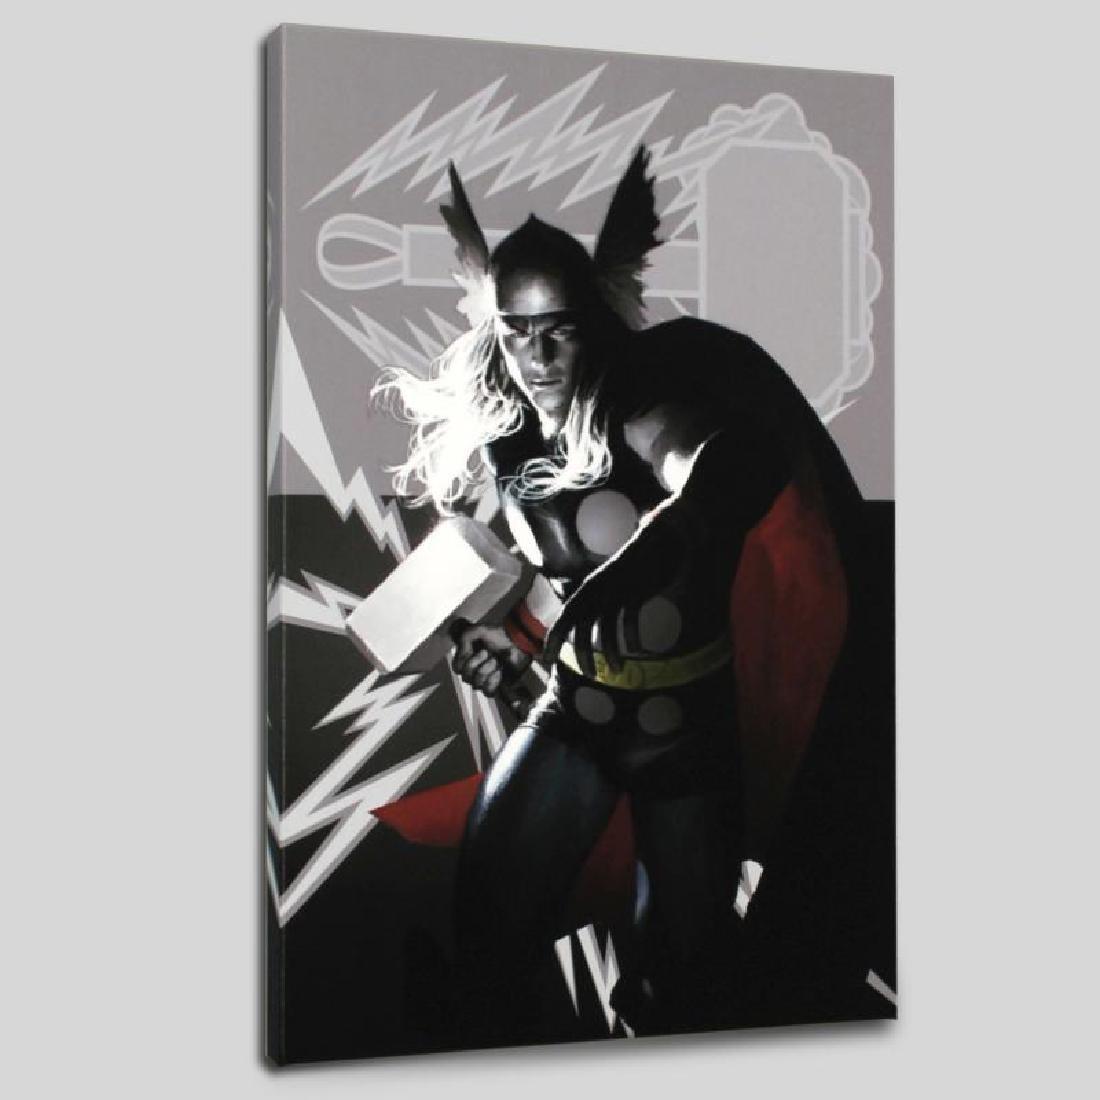 """Wolverine Avengers Origins: Thor #1 & The X-Men #2"""